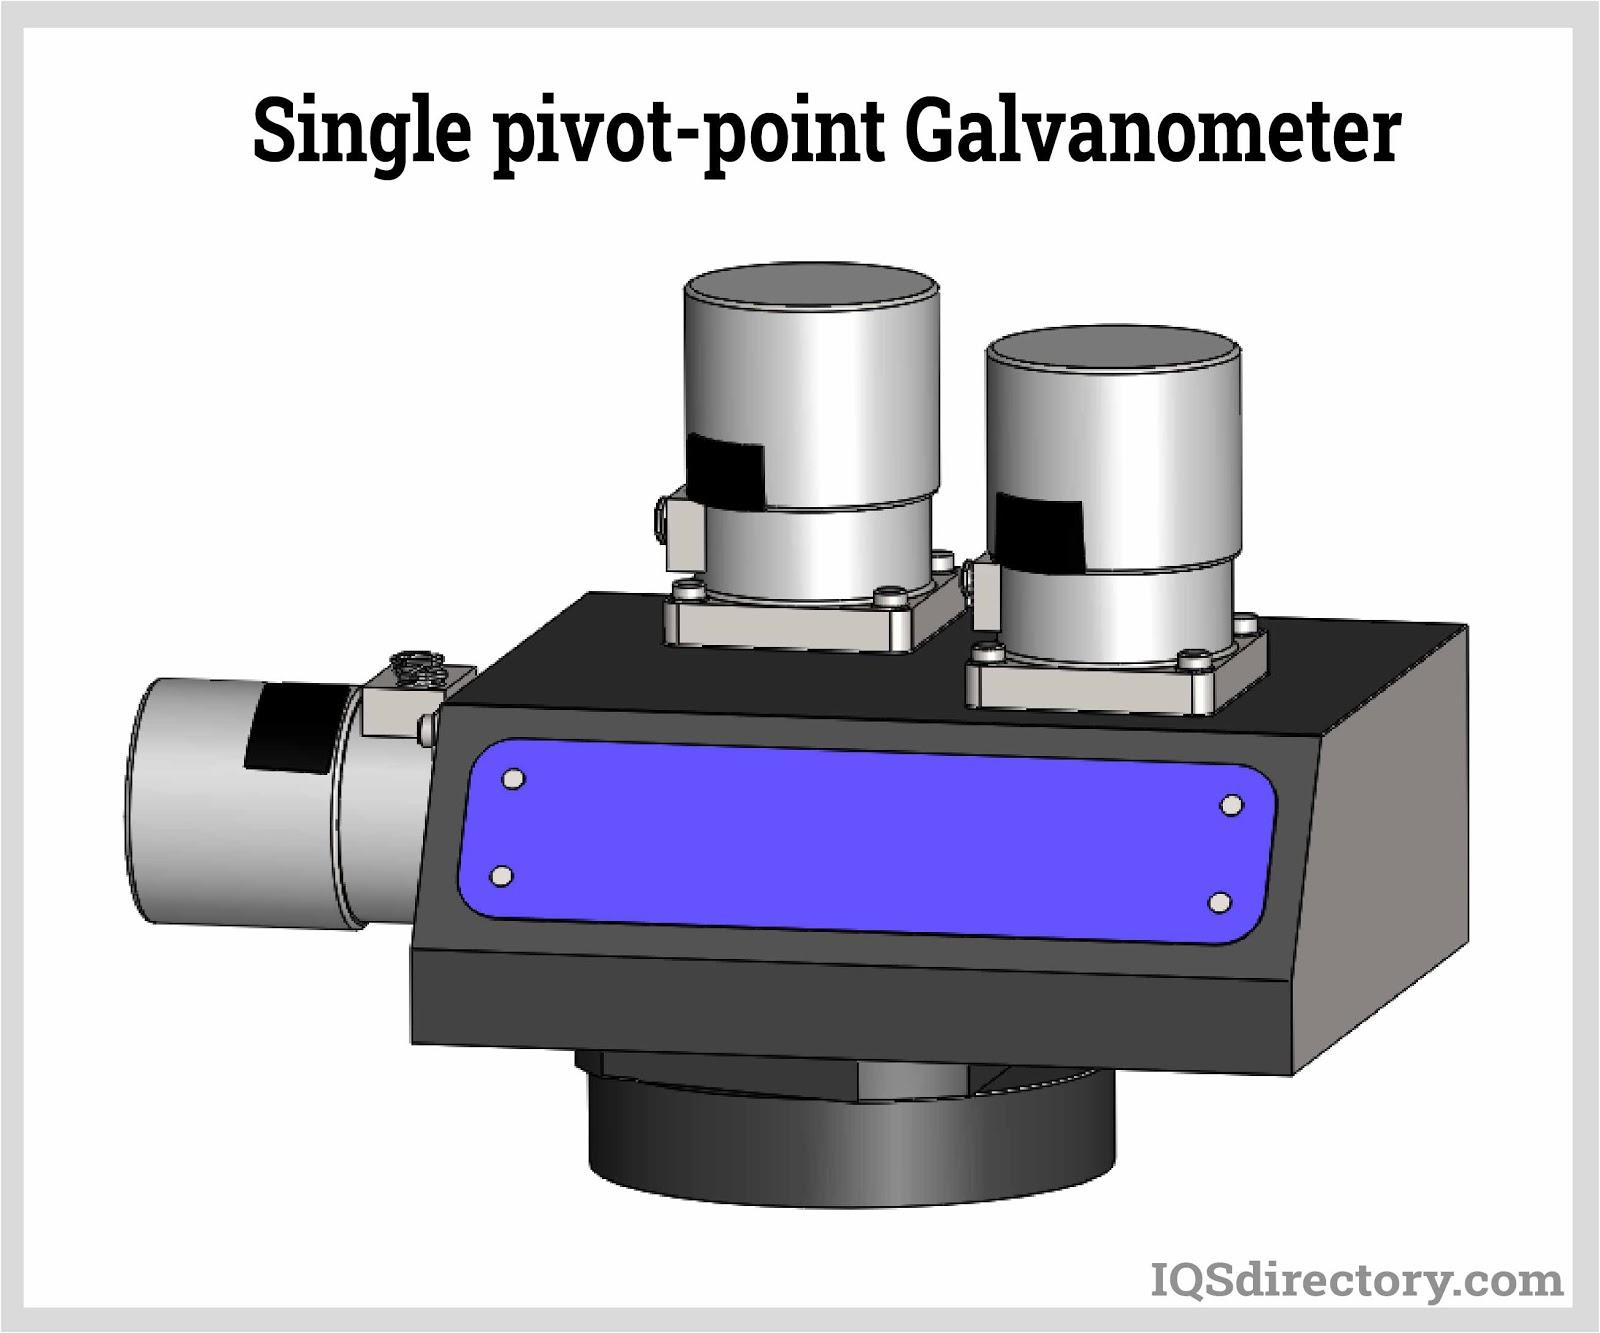 Single Pivot-Point Galvanometer